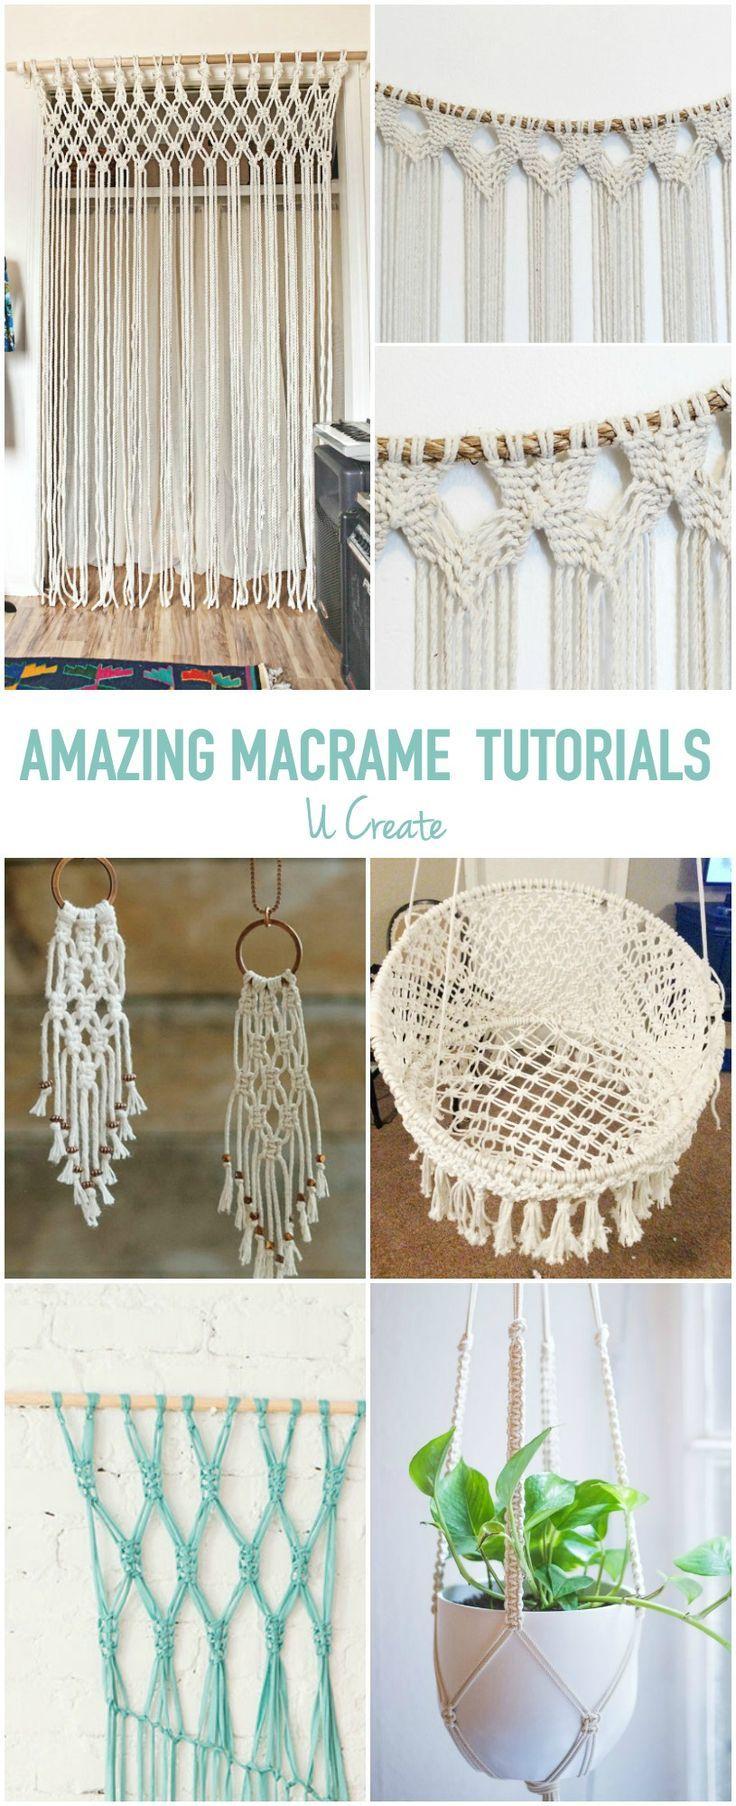 Amazing Macrame Tutorials                                                                                                                                                     More